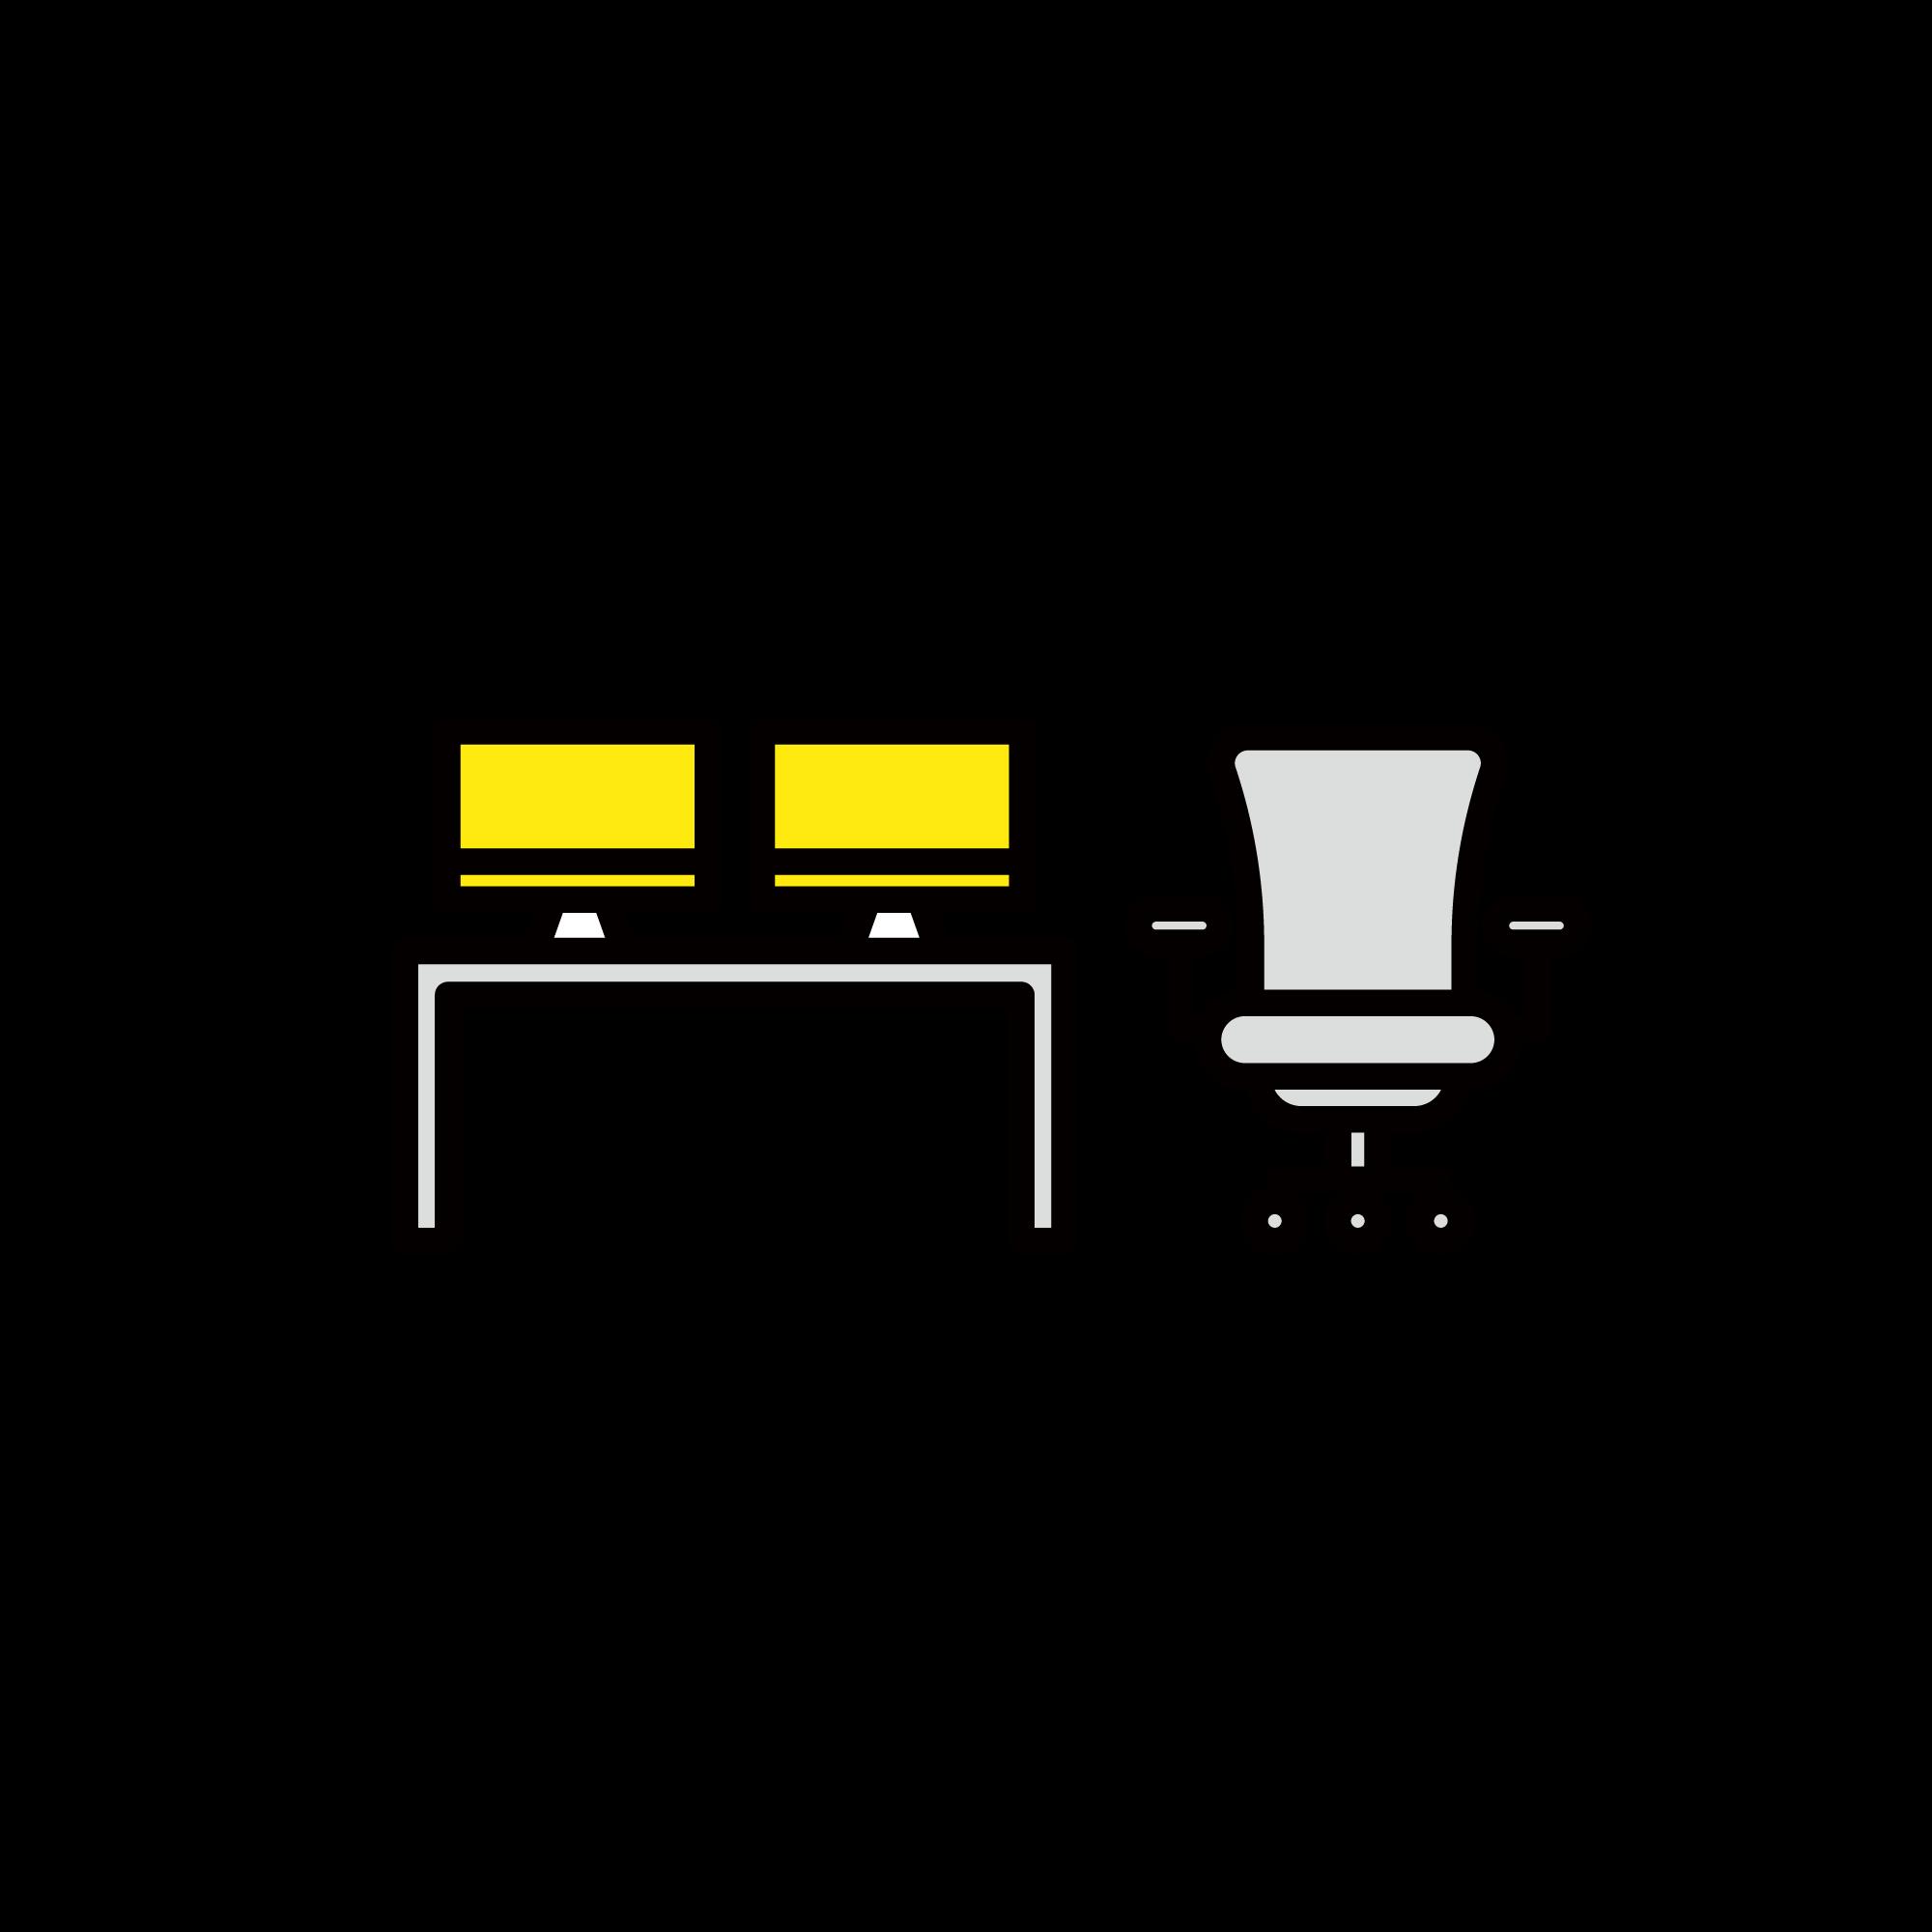 logoアートボード 2 のコピー 2@2000x.png